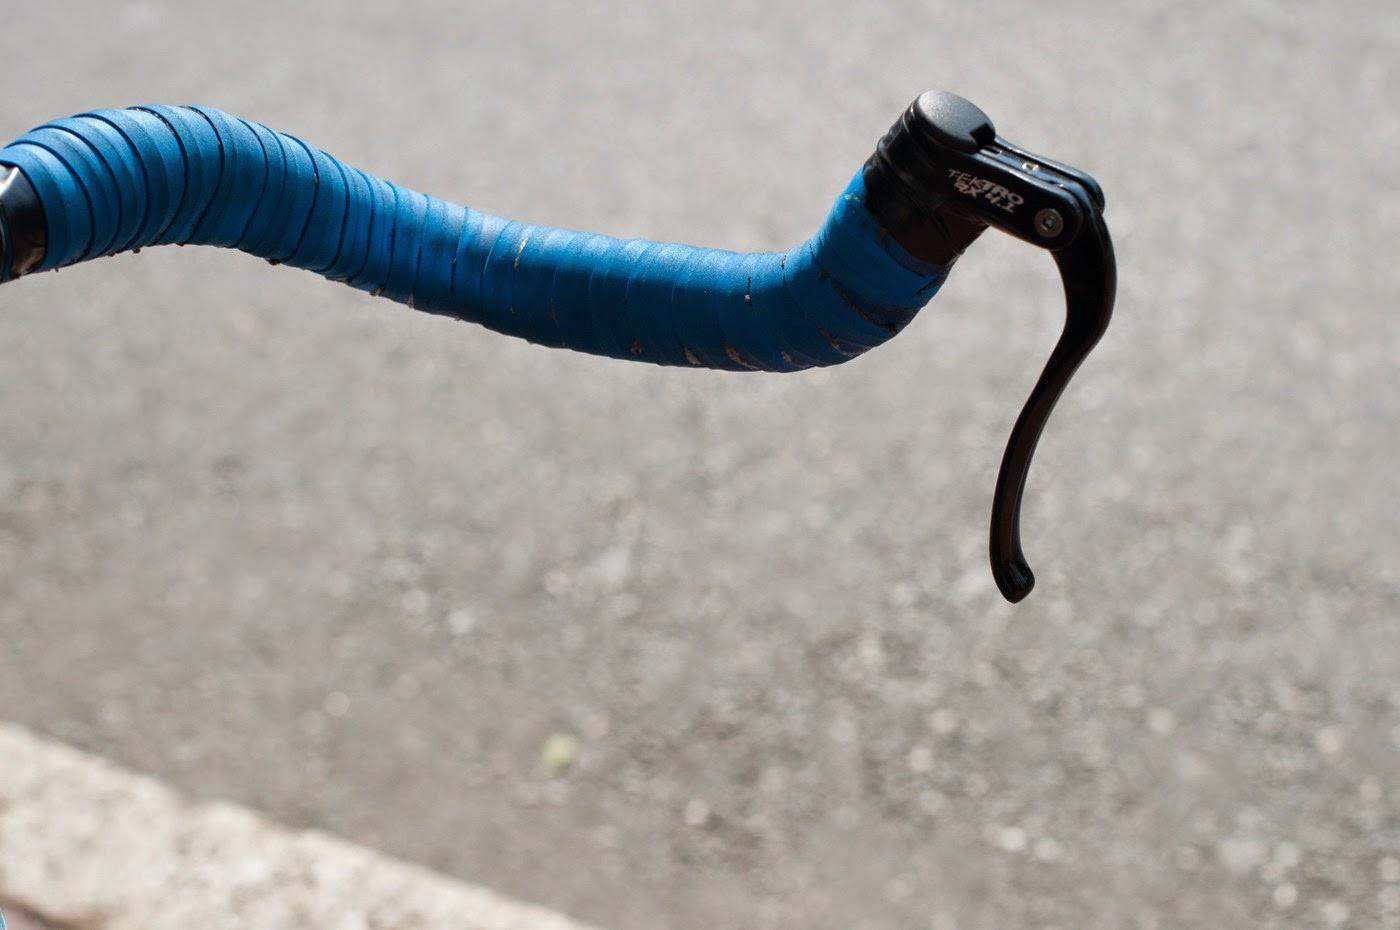 Fixie, fixed speed, bicycle, boston, USA, custom, customised, blue, tim Macauley, the biketorialist, shimano, frame, 3t, ritchey, tiagra, time trial, handlebars, tektro, brake lever